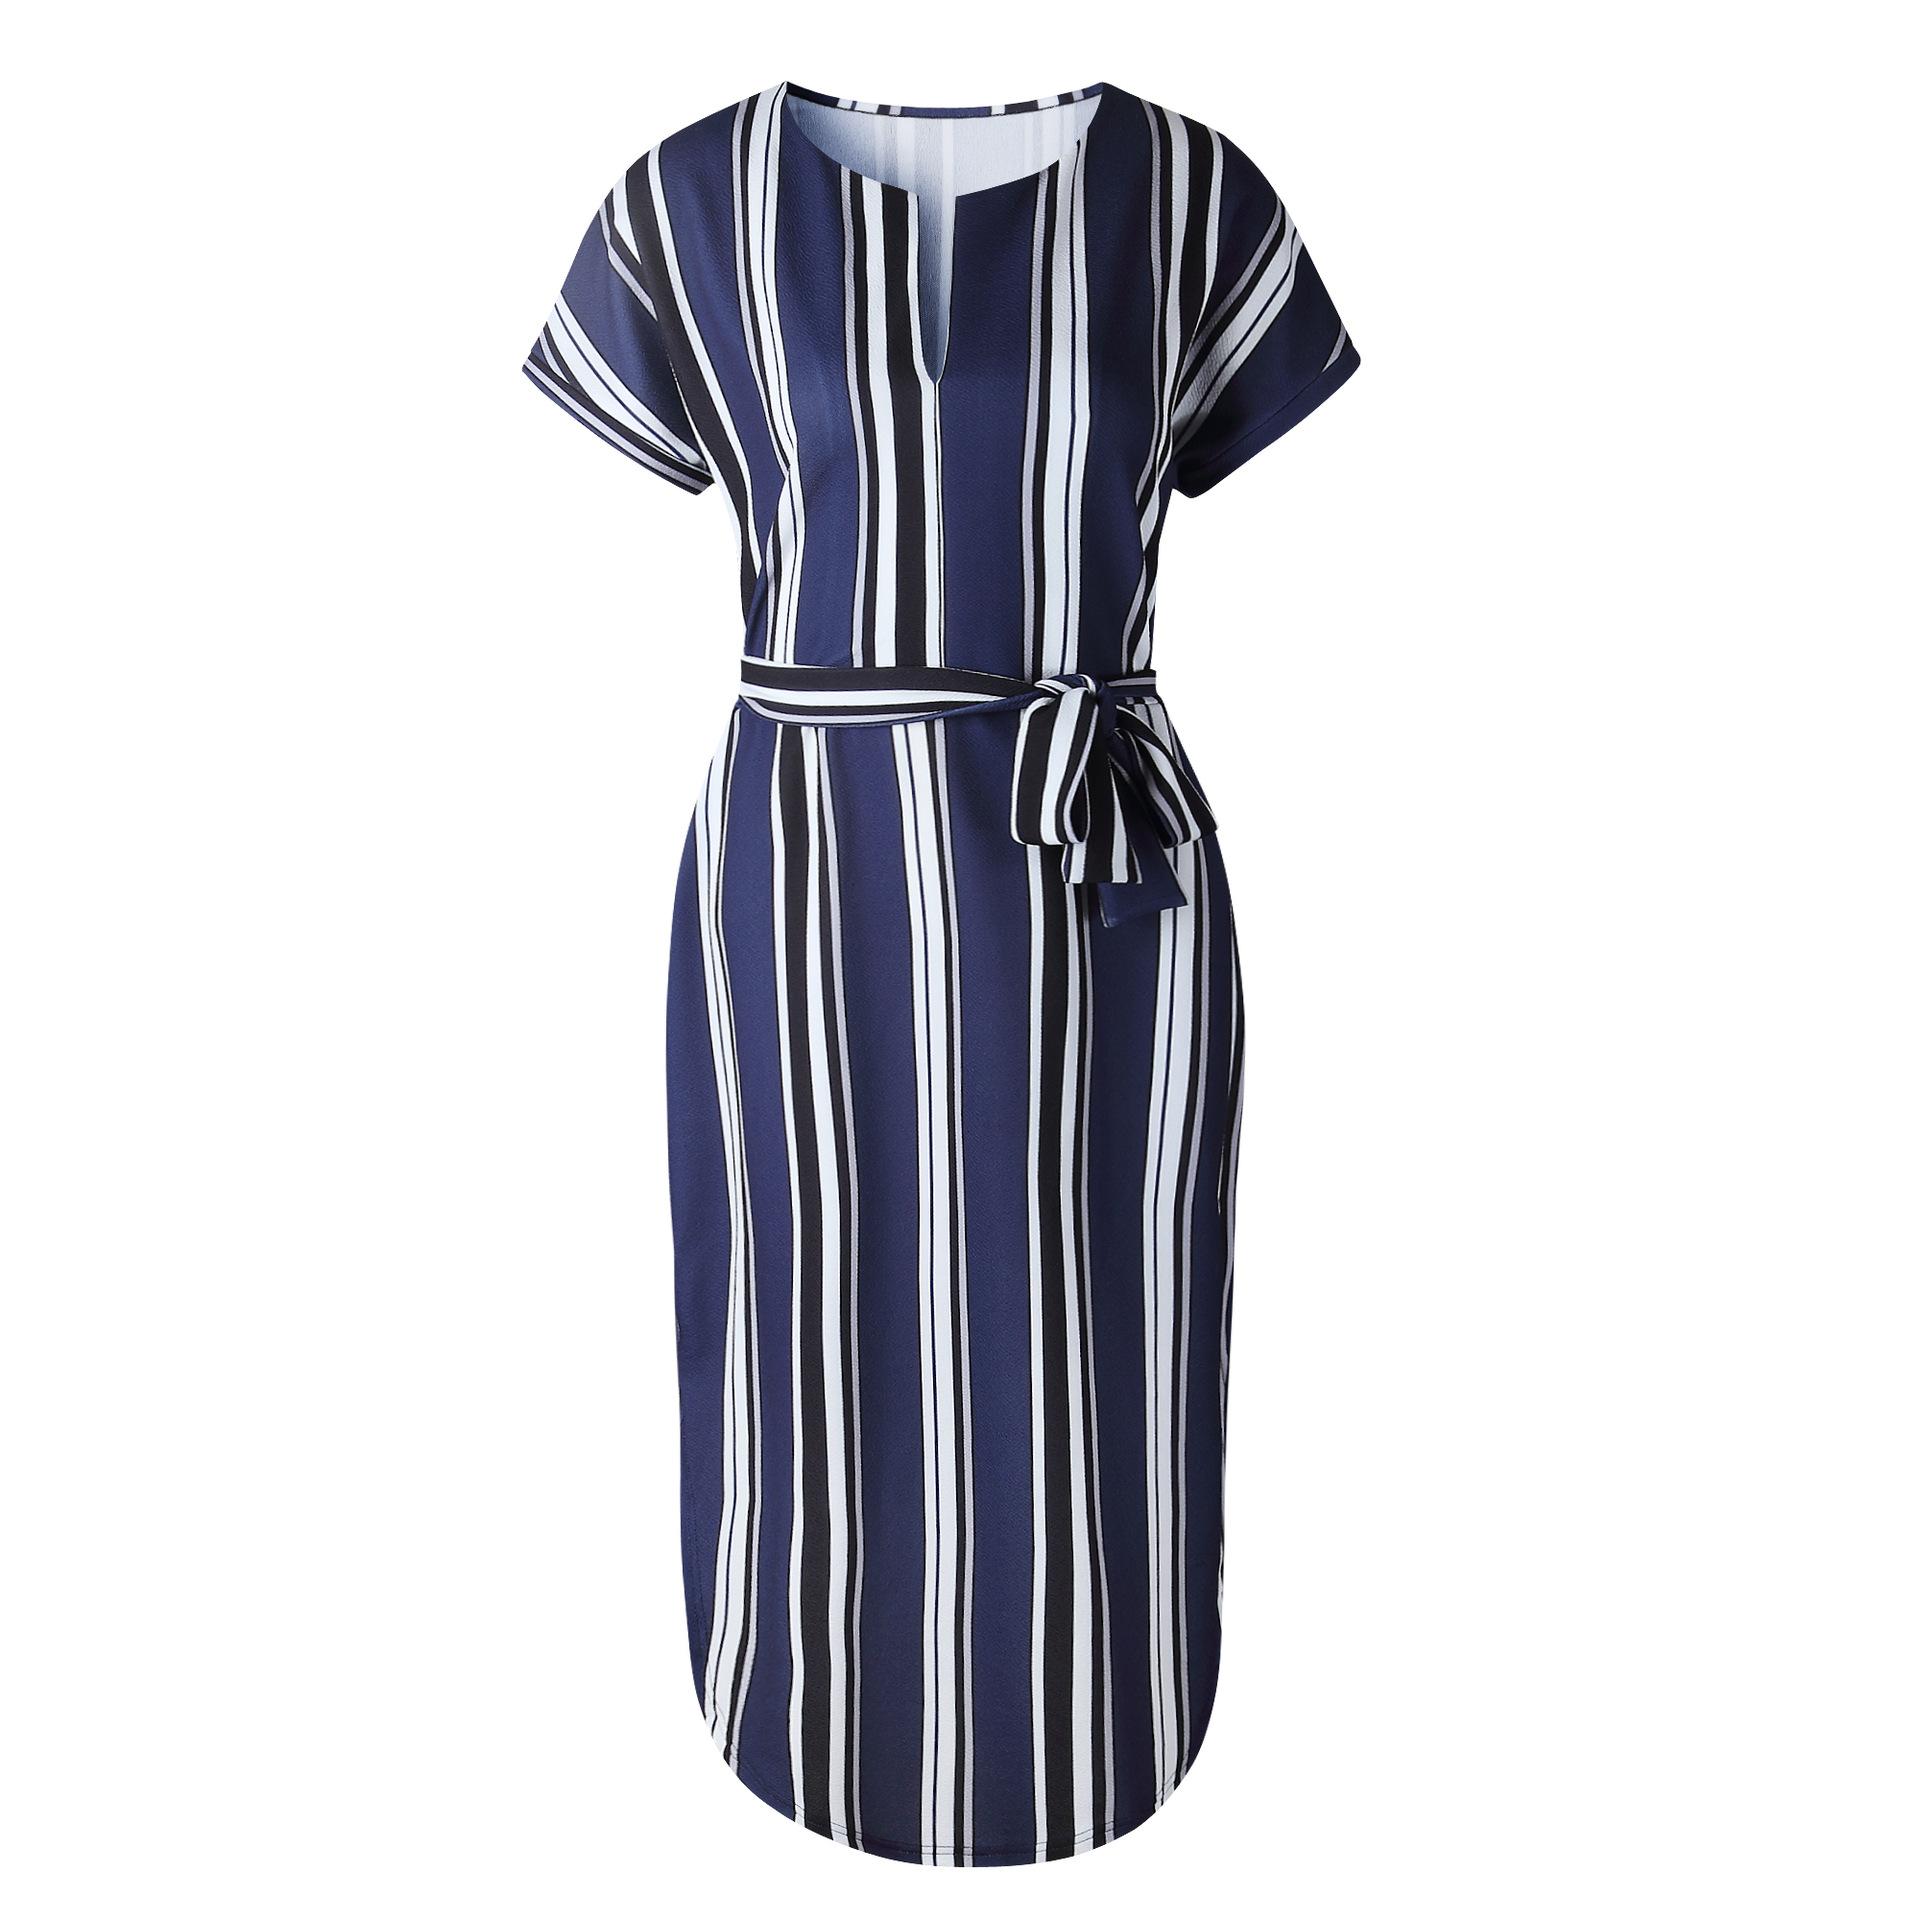 2018 Summer Dress Women Print V Neck Short Sleeve Robe Female Dresses Casual Sashes Midi Dress Ladies Elegant Vestidos Dropship 35